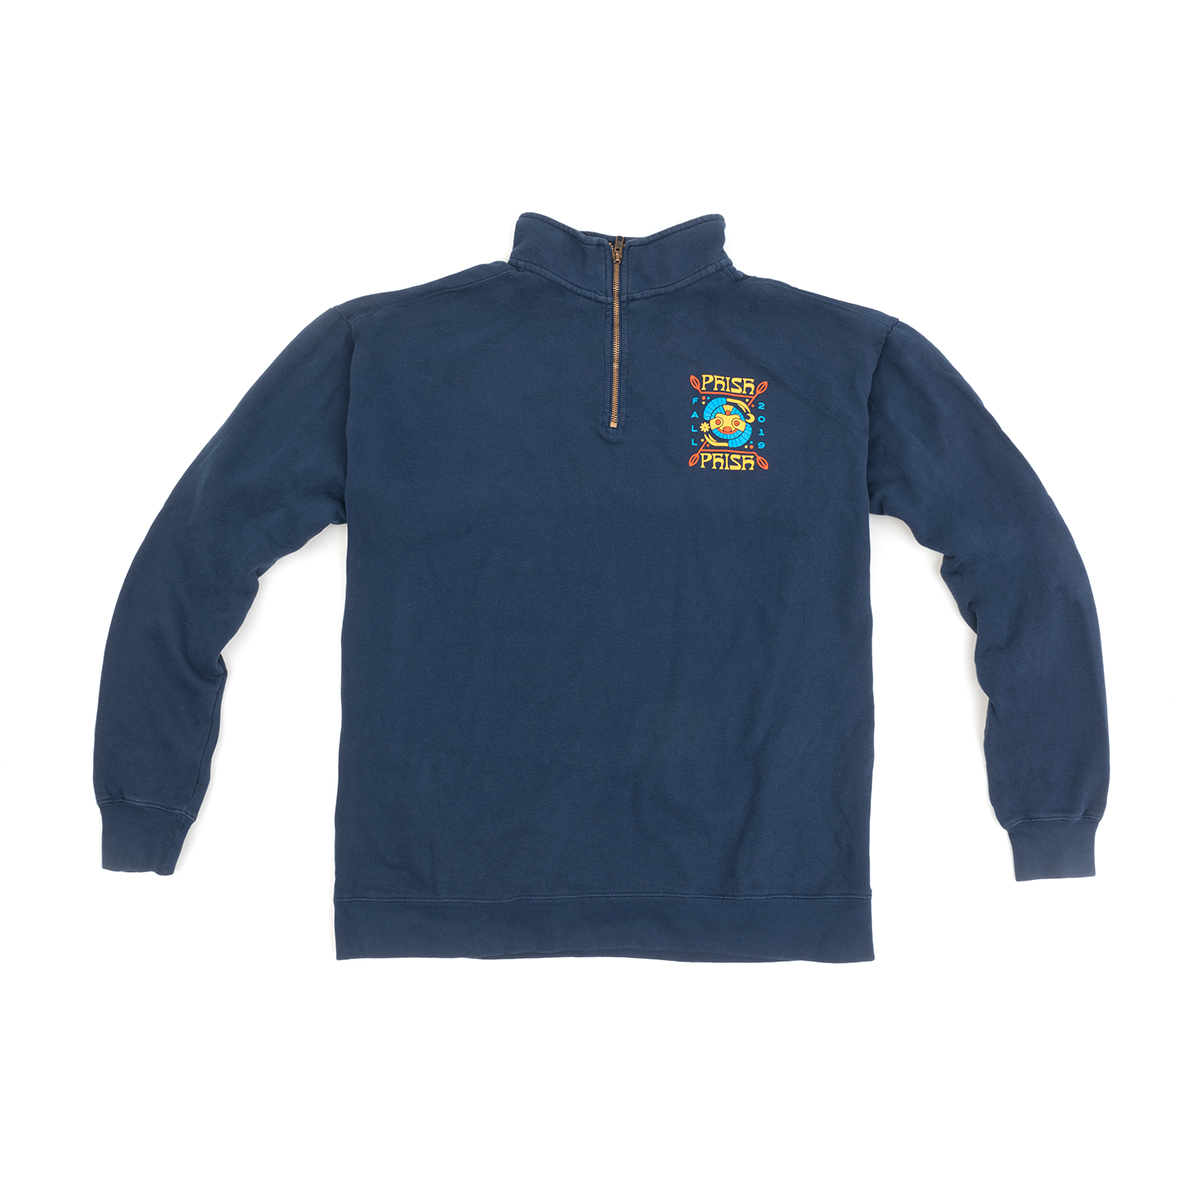 Fall Tour Sloth 1/4 Zip Pullover Sweatshirt